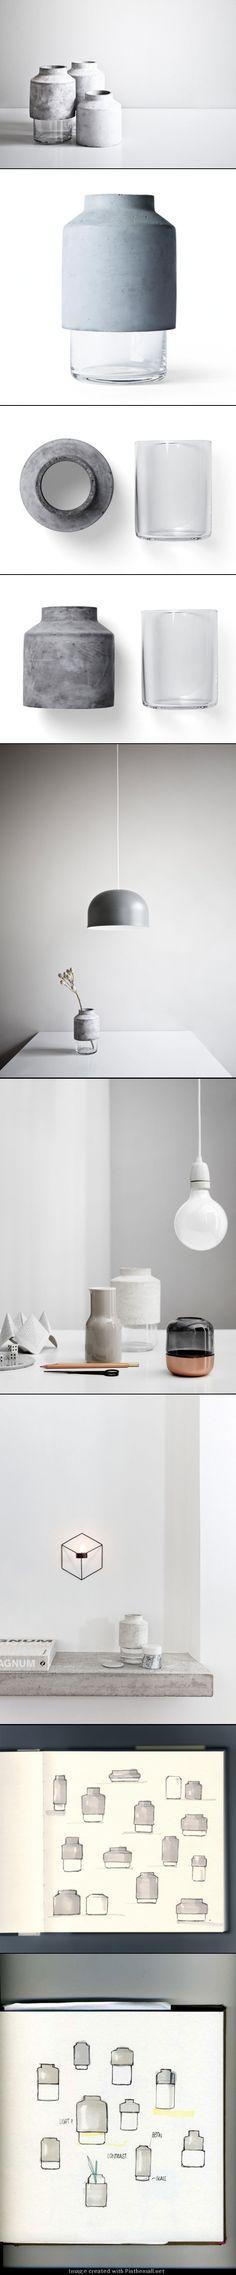 Concrete vase | Concrete product design | Cement | WIllman design | Beton design | Betonlook | www.eurocol.com